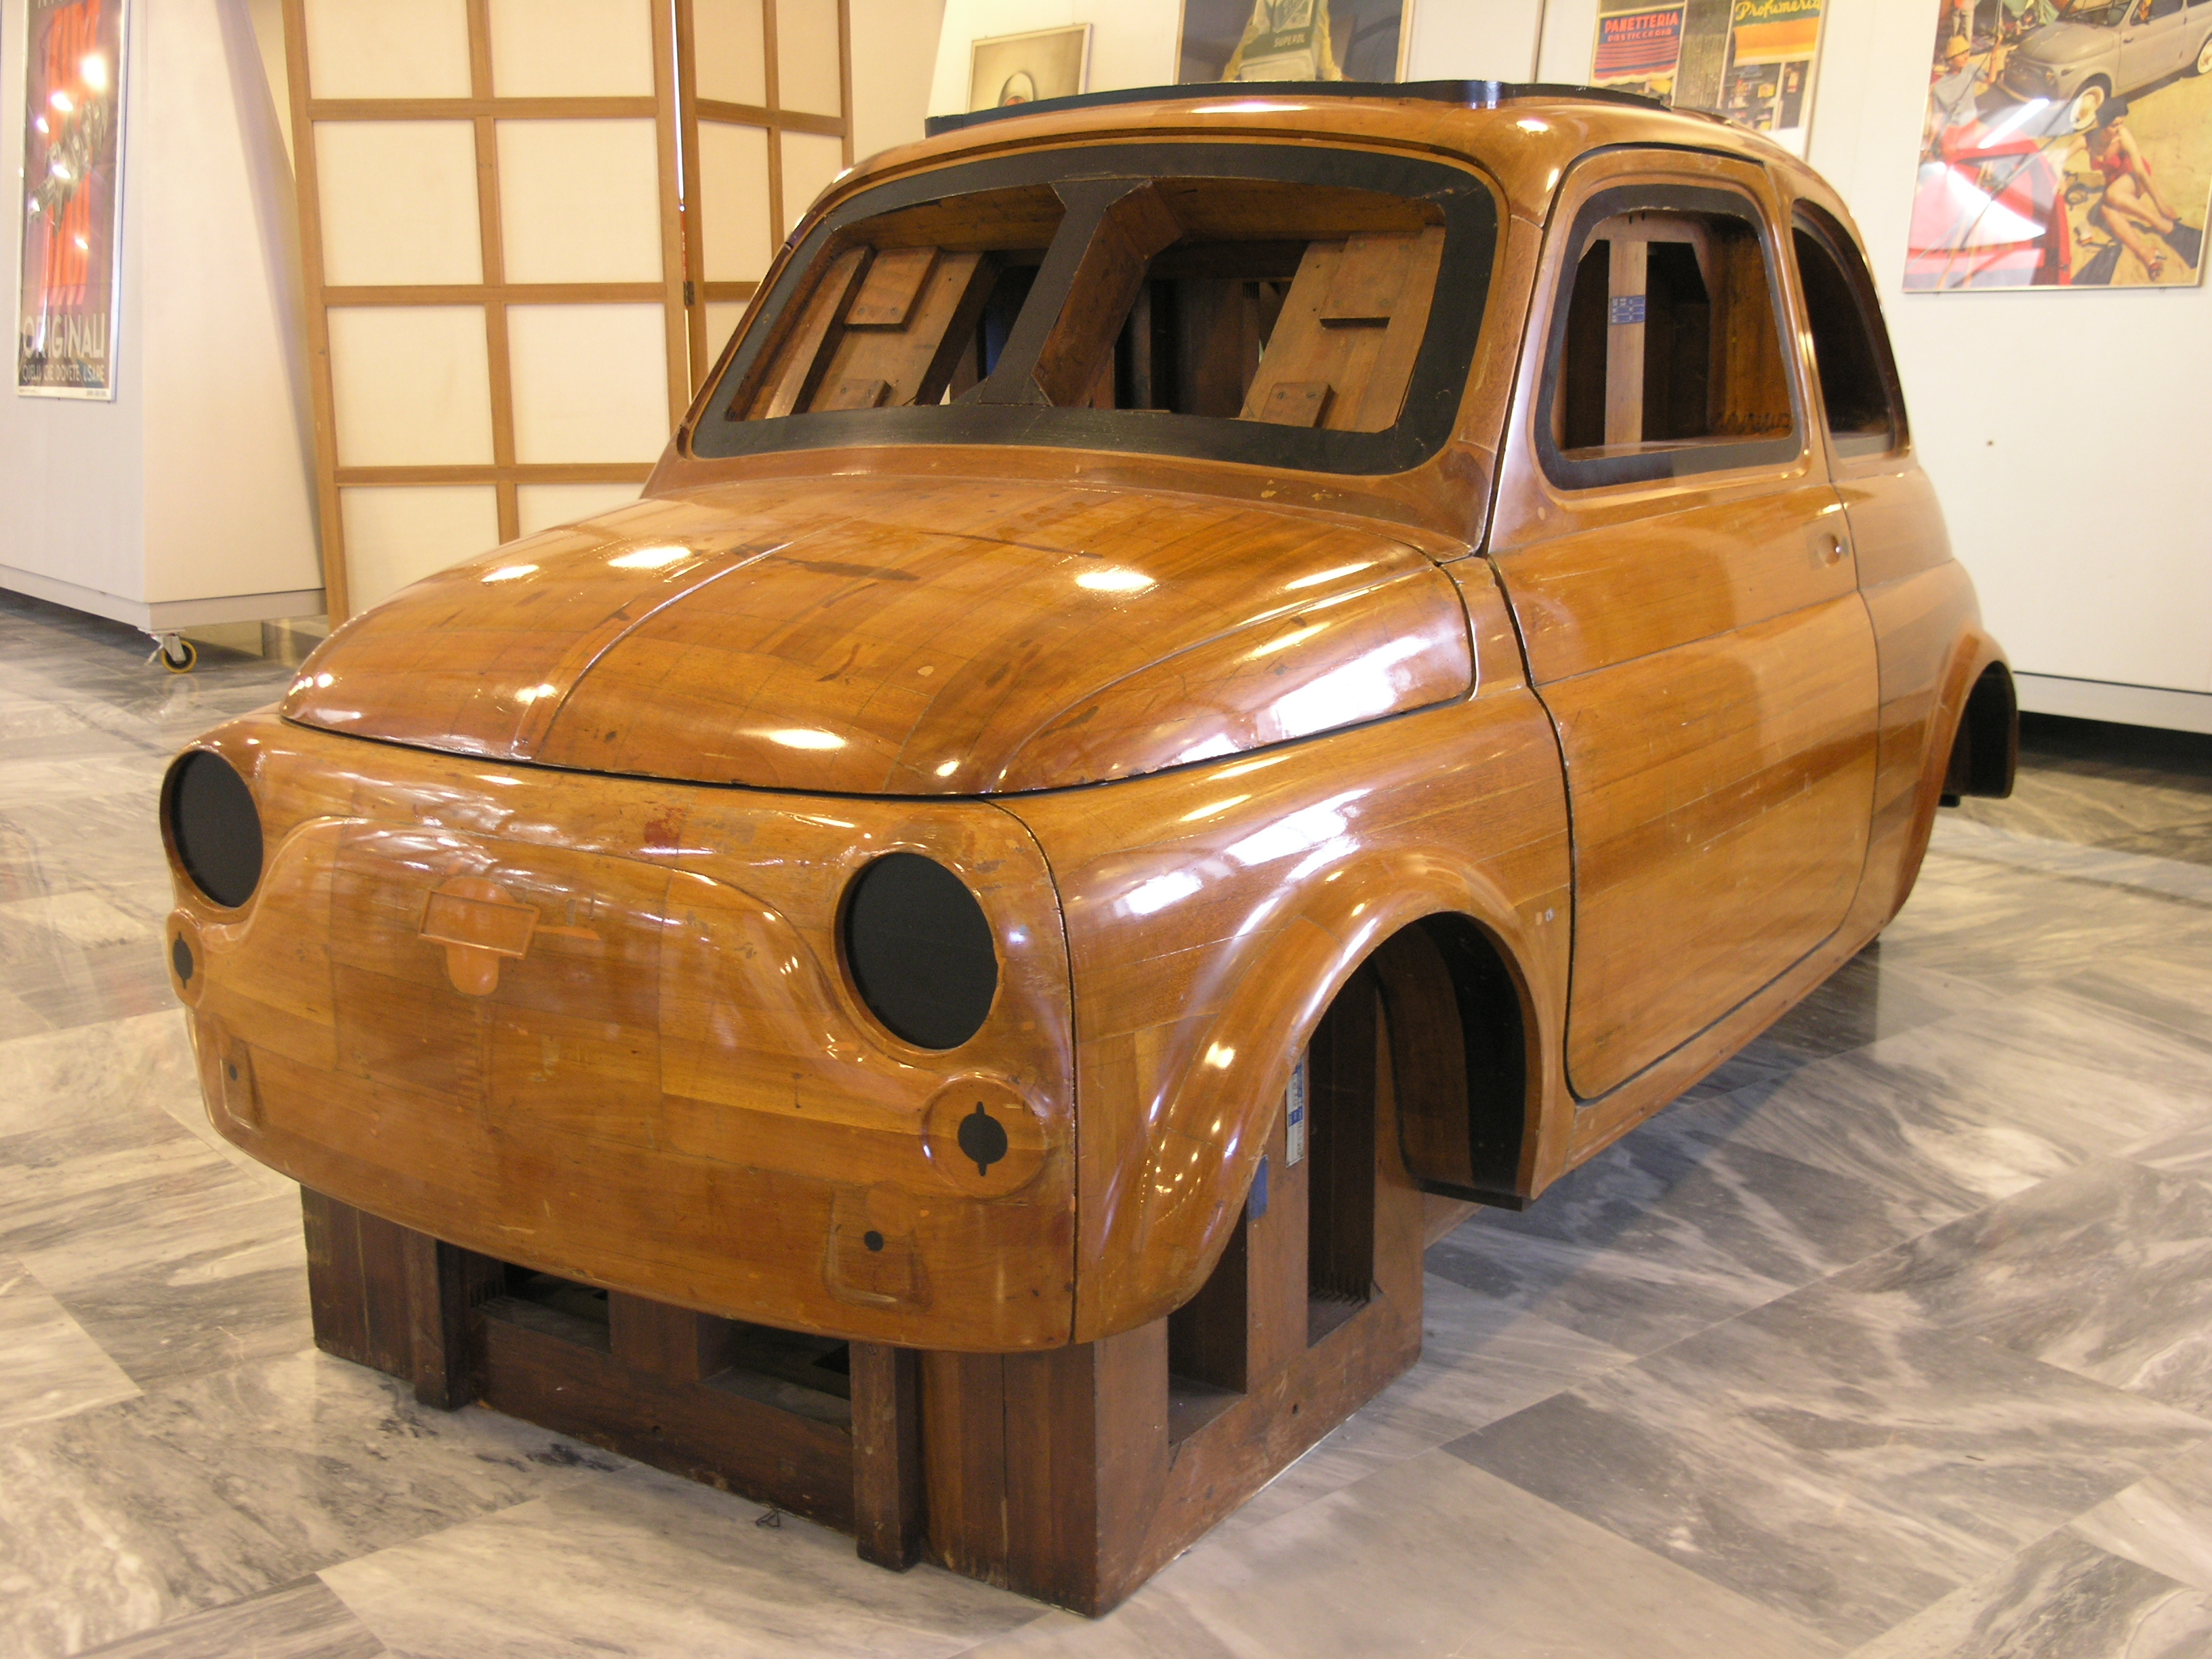 Classic Car Cardboard Cutouts